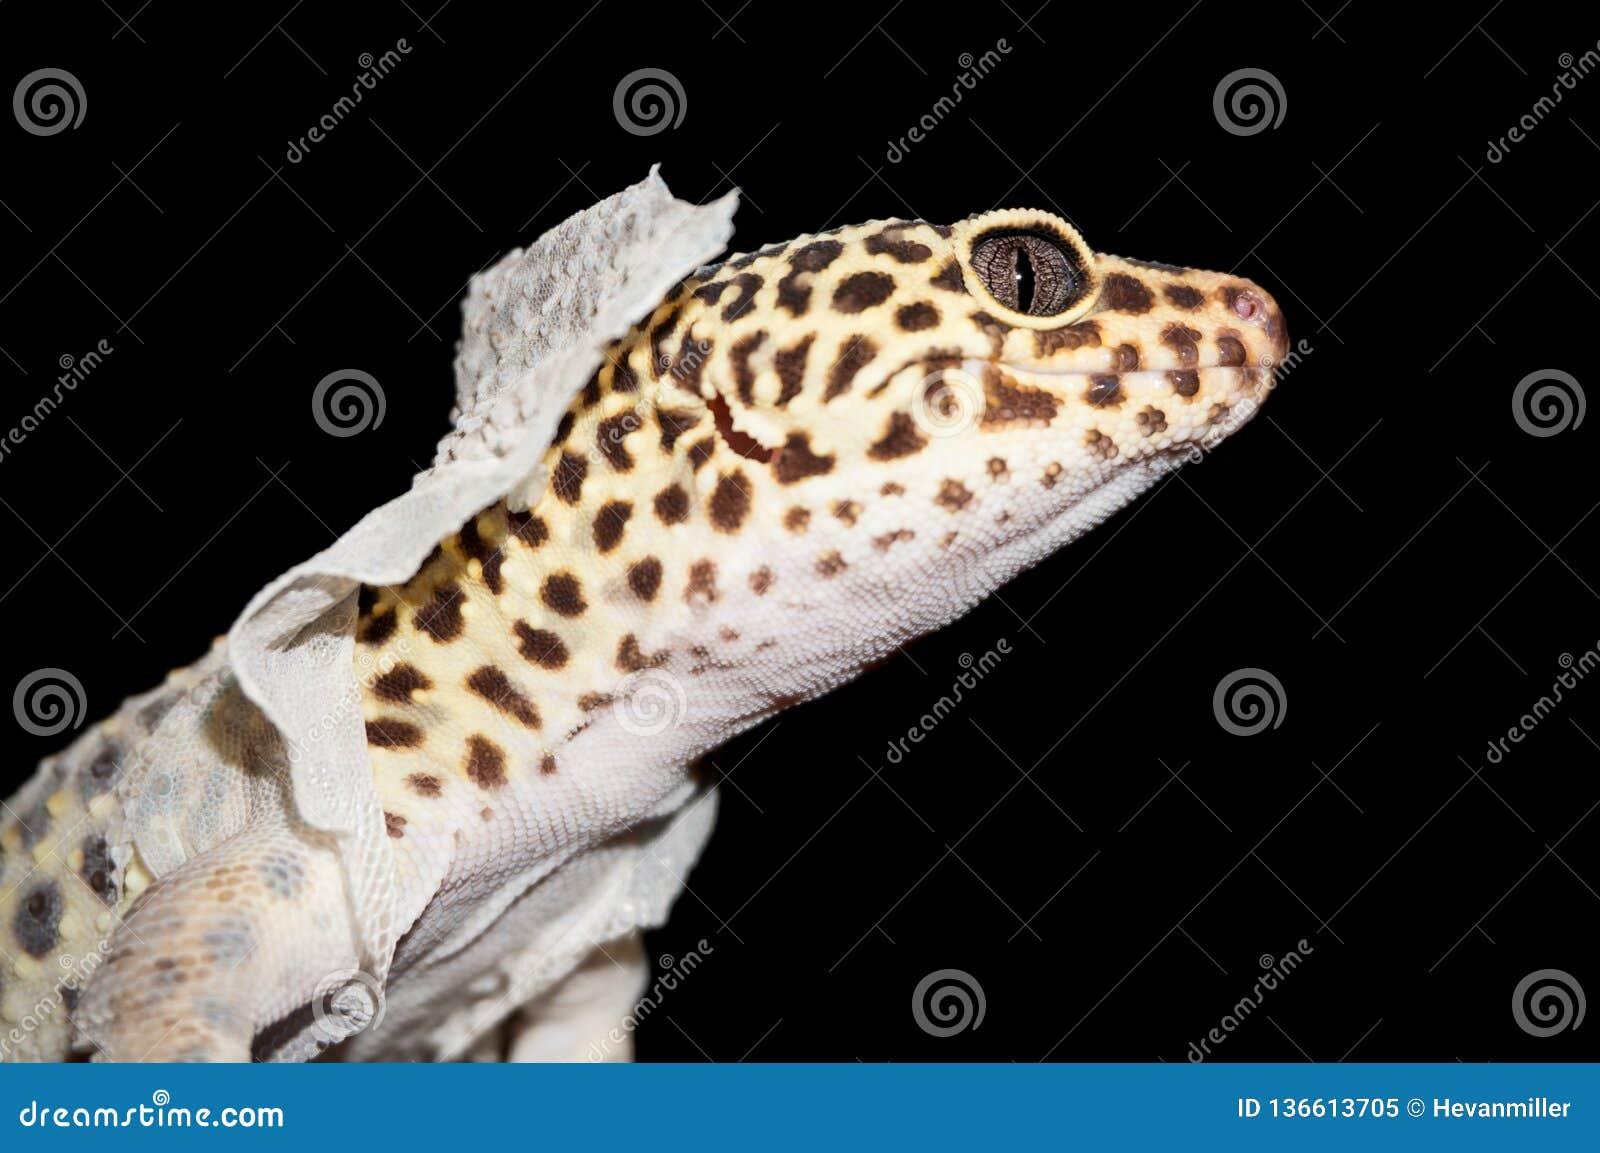 Isolated Shot of Leopard Gecko Shedding Skin